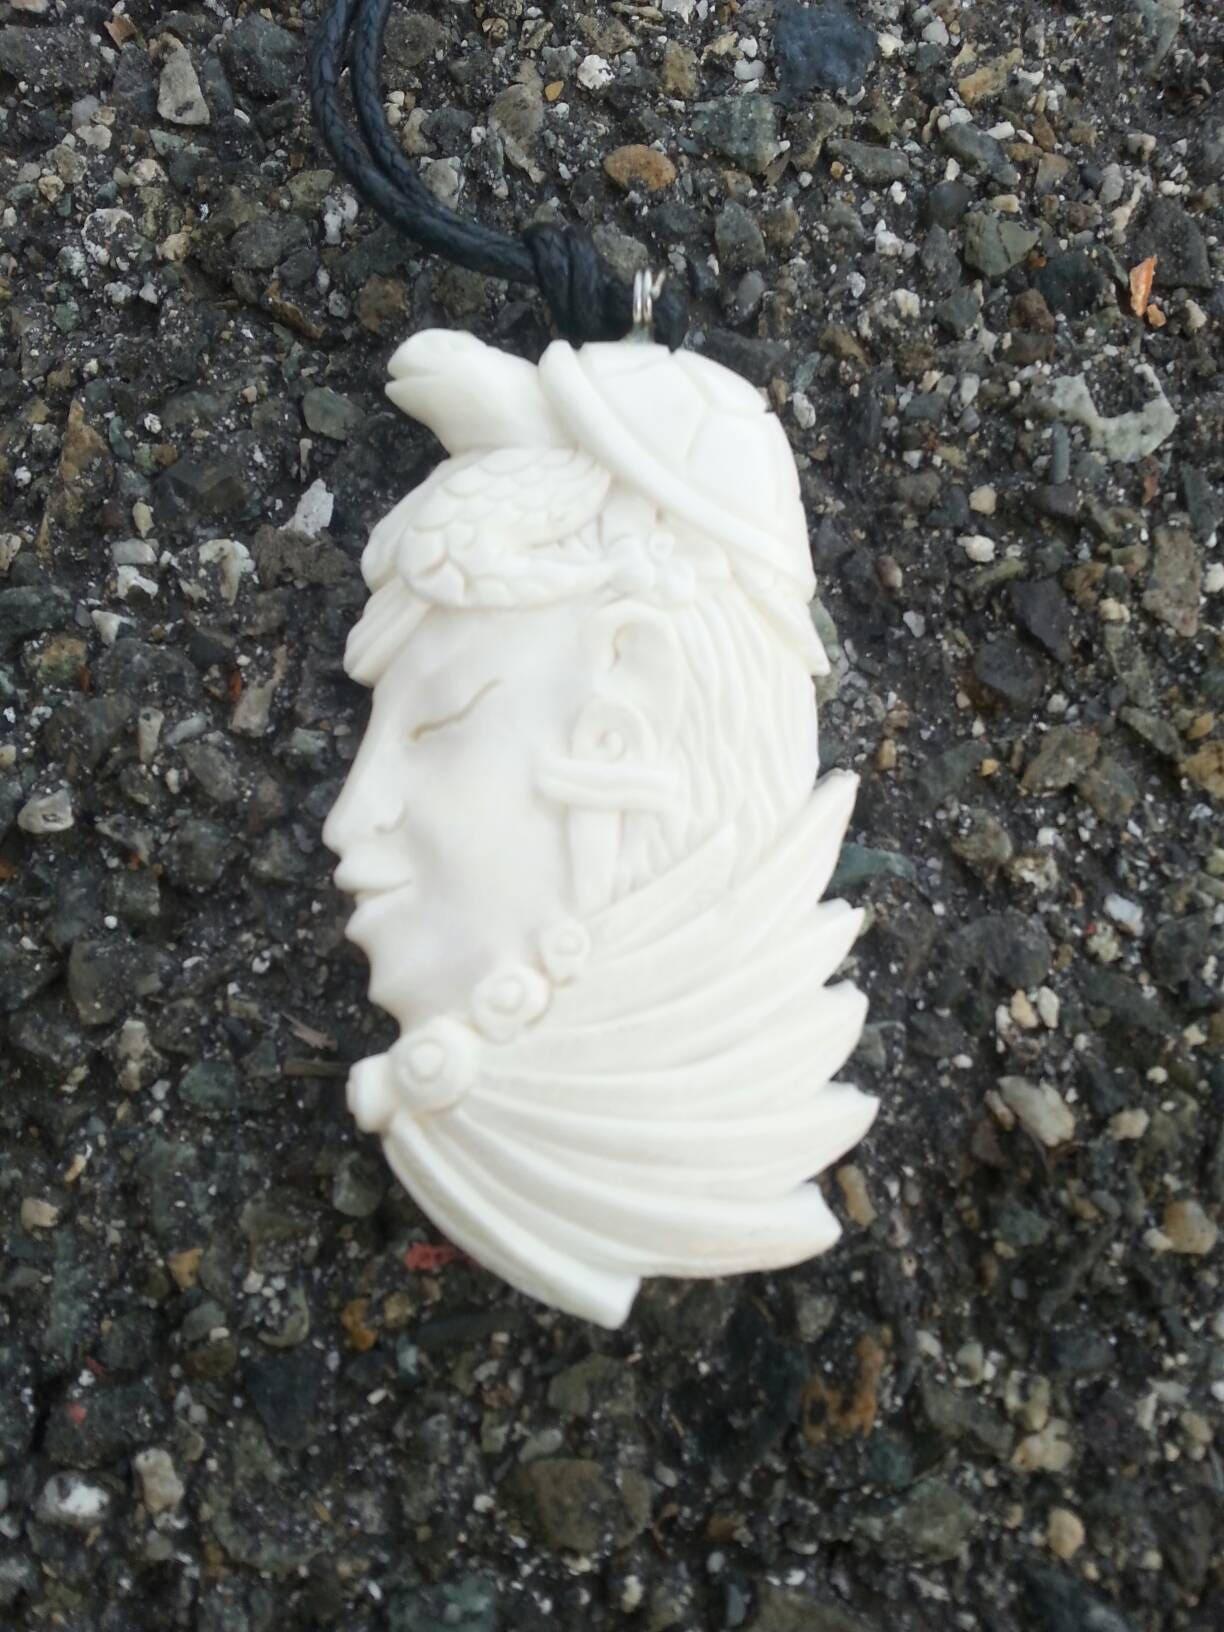 Bone Necklace Shaman Turtle Carved Bone Jewelry Feathers Pendant Handmade Vintage White Crystals Native Jewelry